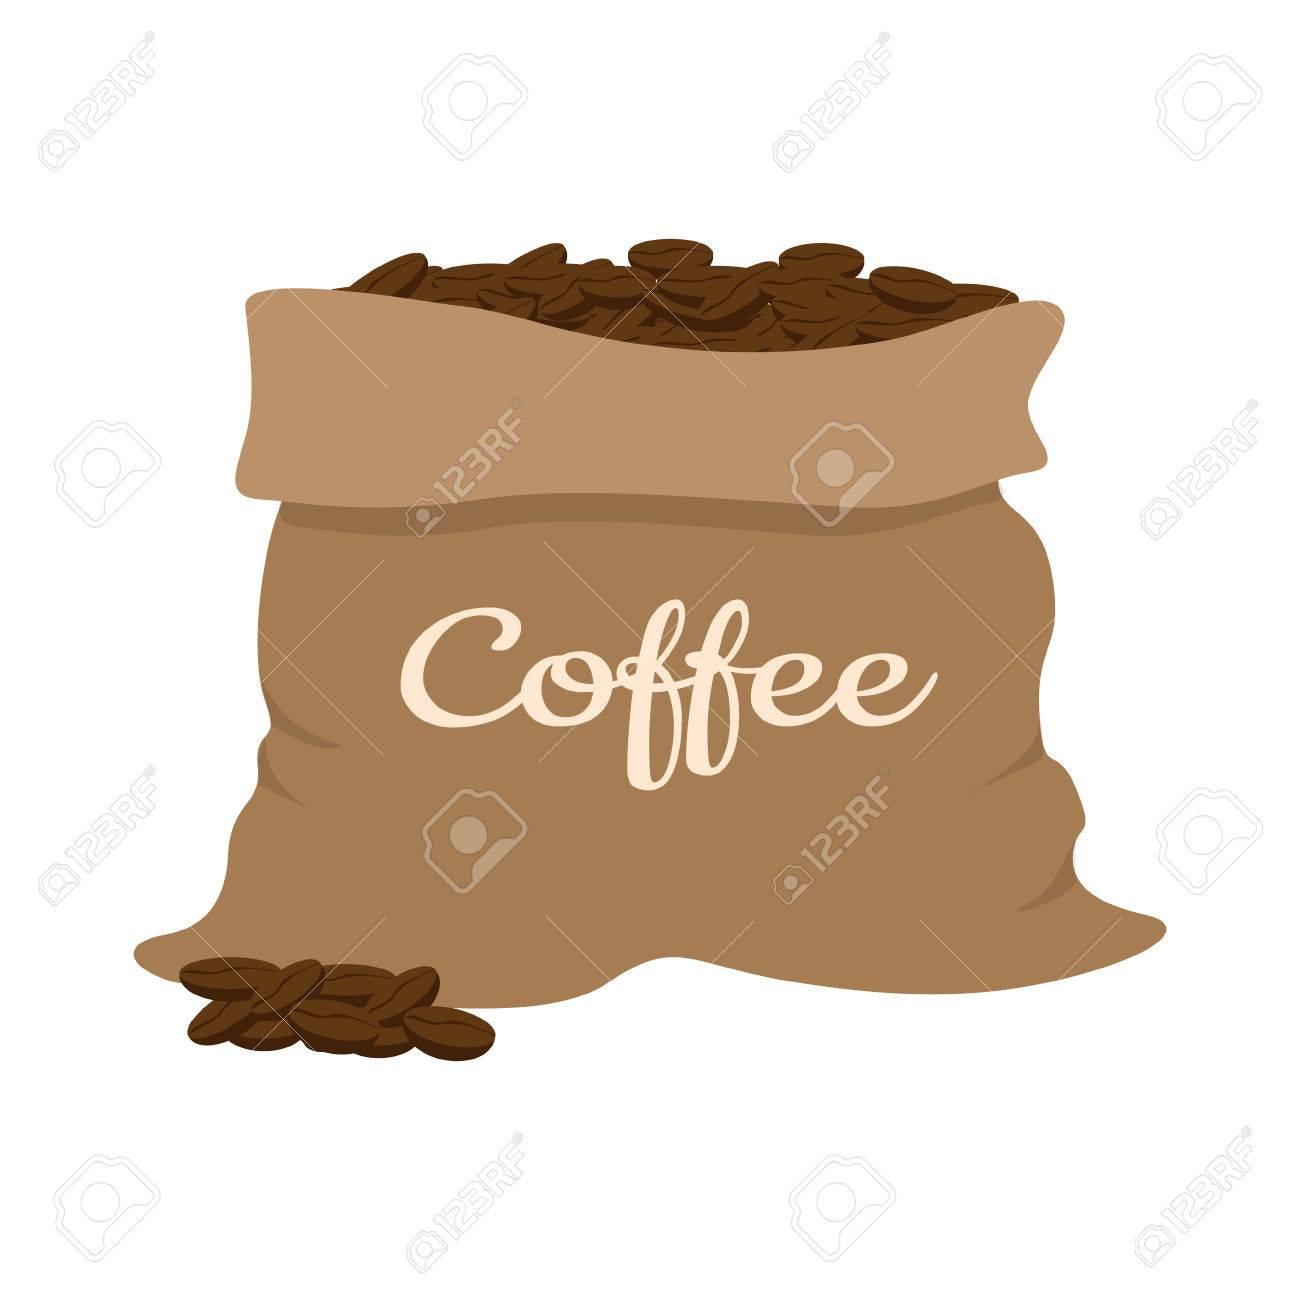 Coffee Bean Bag Clipart & Free Clip Art Images #28132.